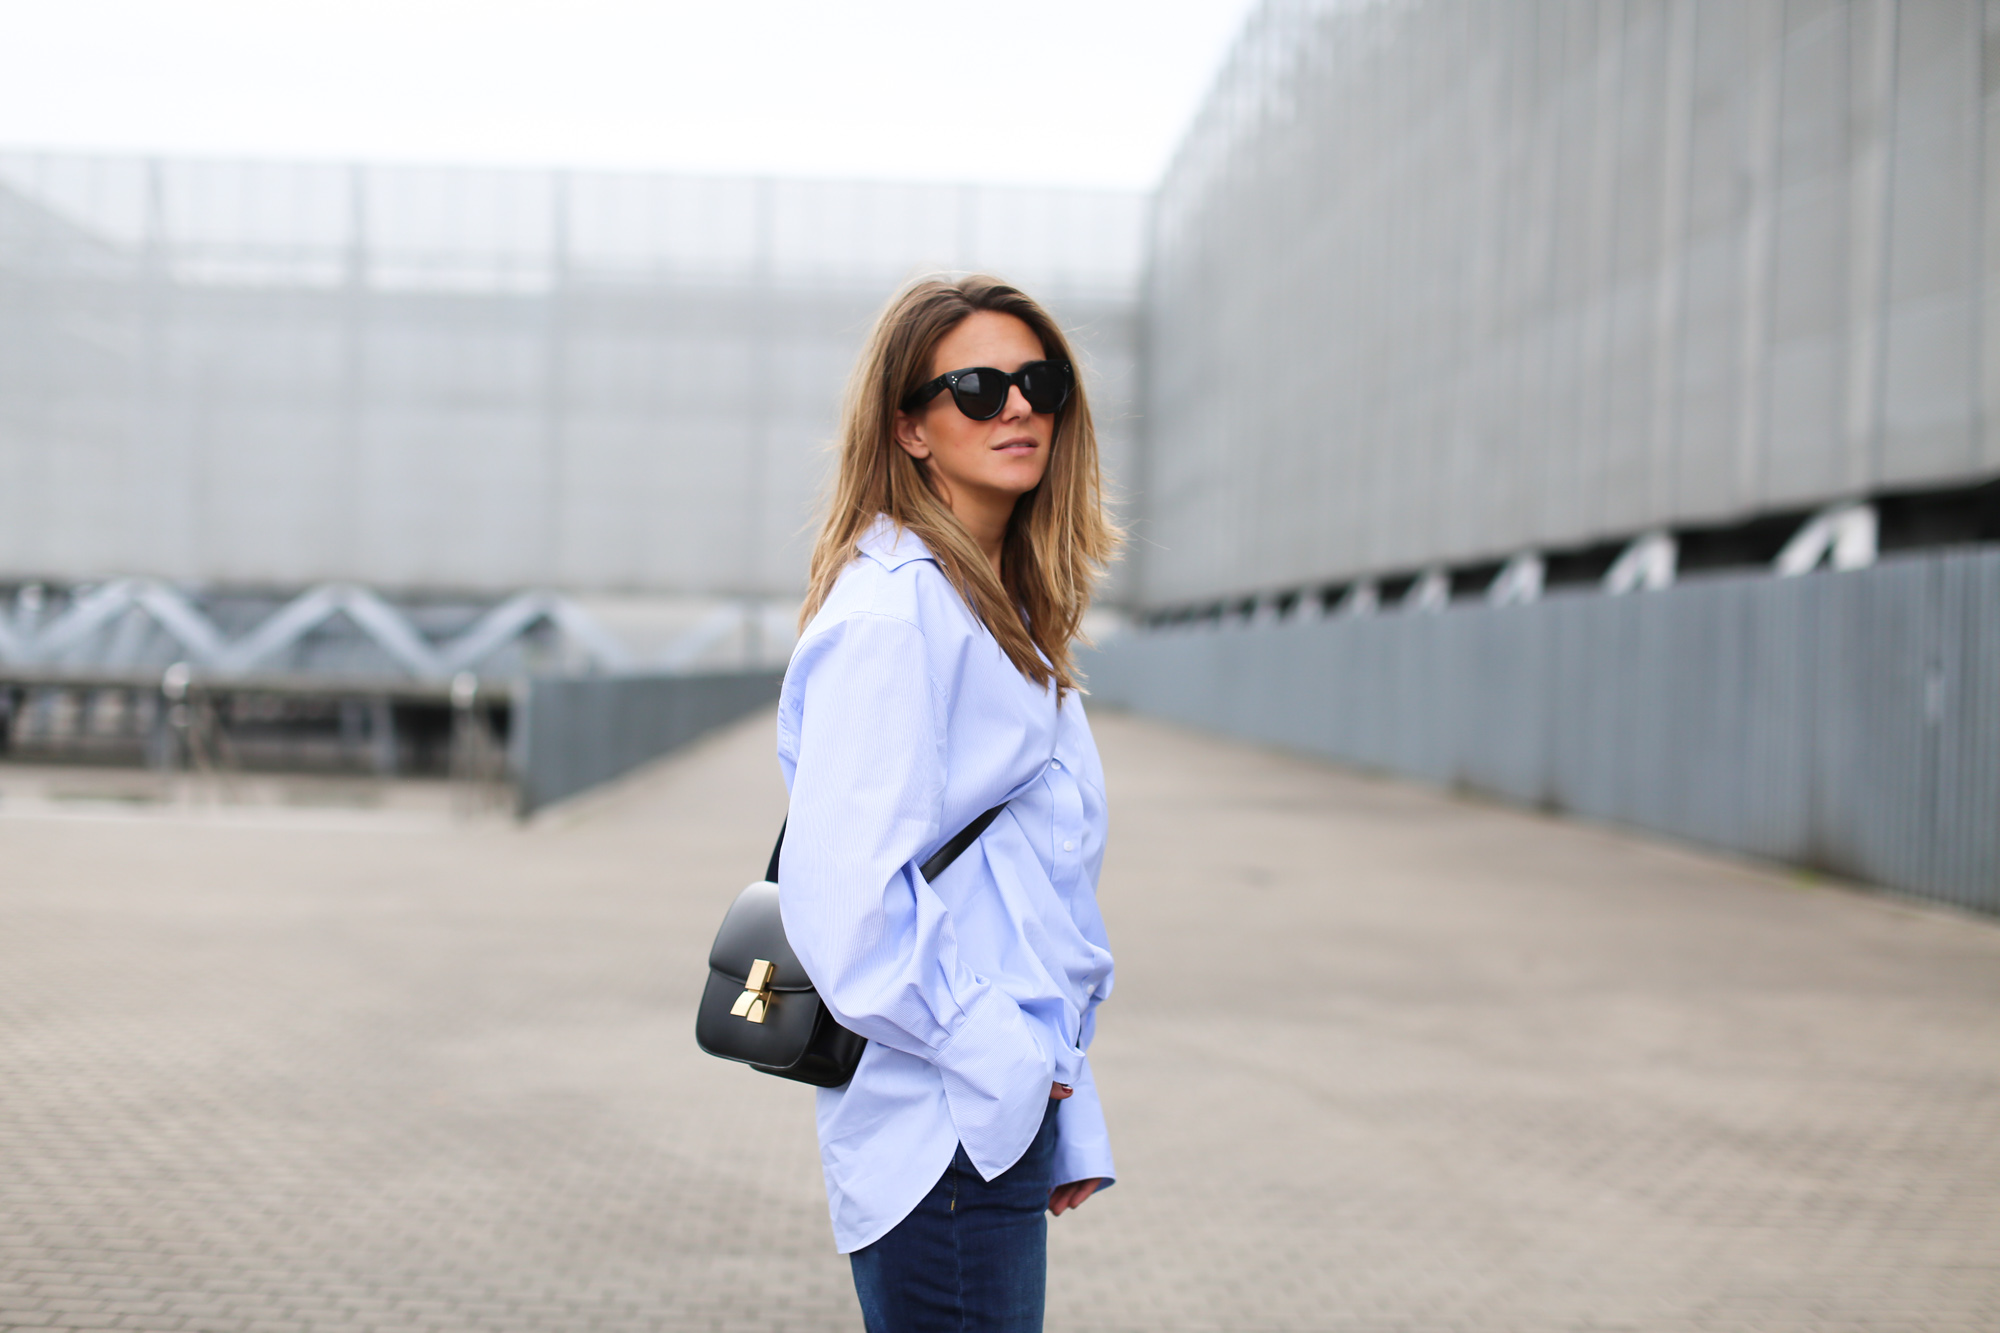 Clochet_fashionblogger_streetstyle_distressedboyfriendjeans_celineparisboxbag-4